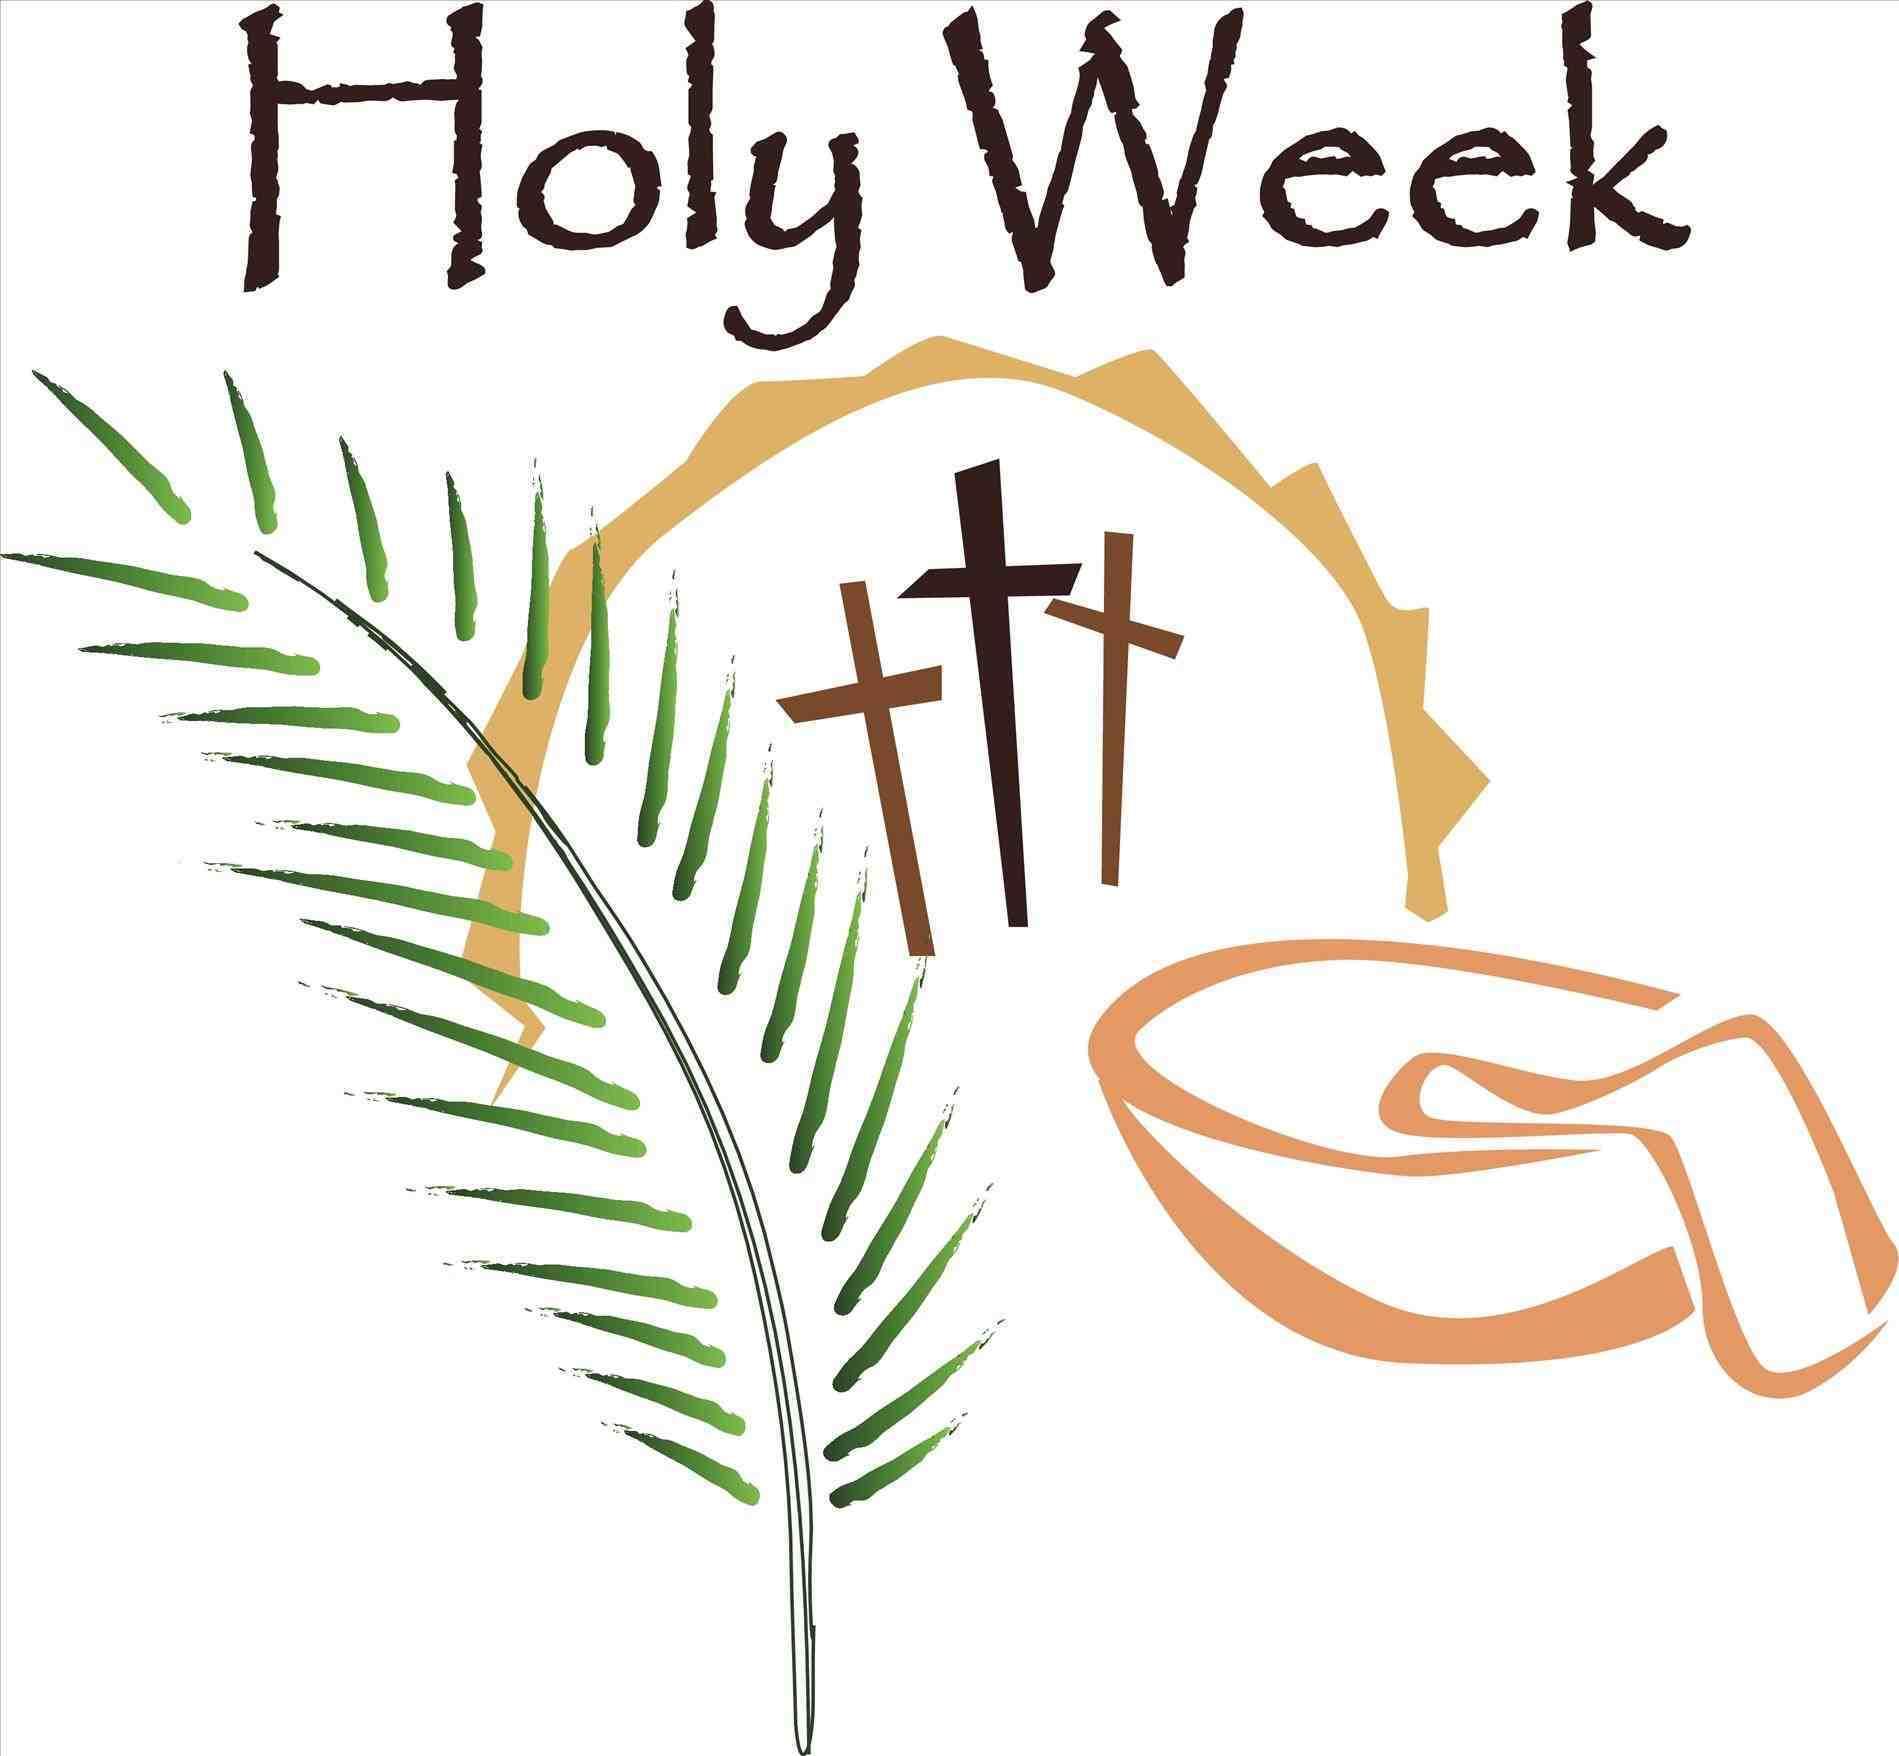 To christian educationrhprayerbookguidewordpresscom at. 2018 clipart holy week